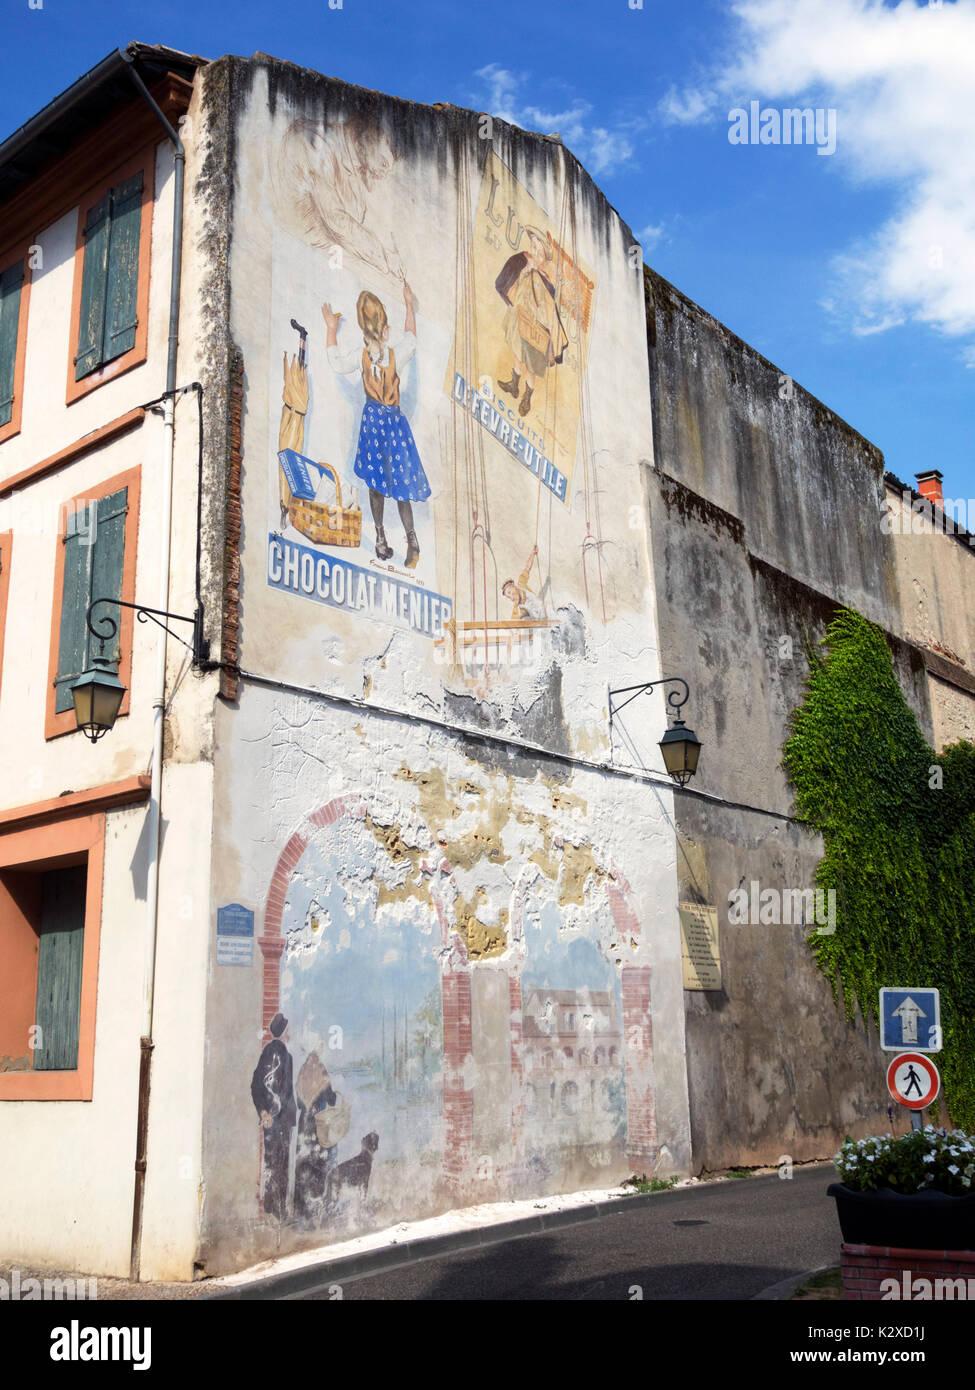 Mural in Moissac, France - Stock Image